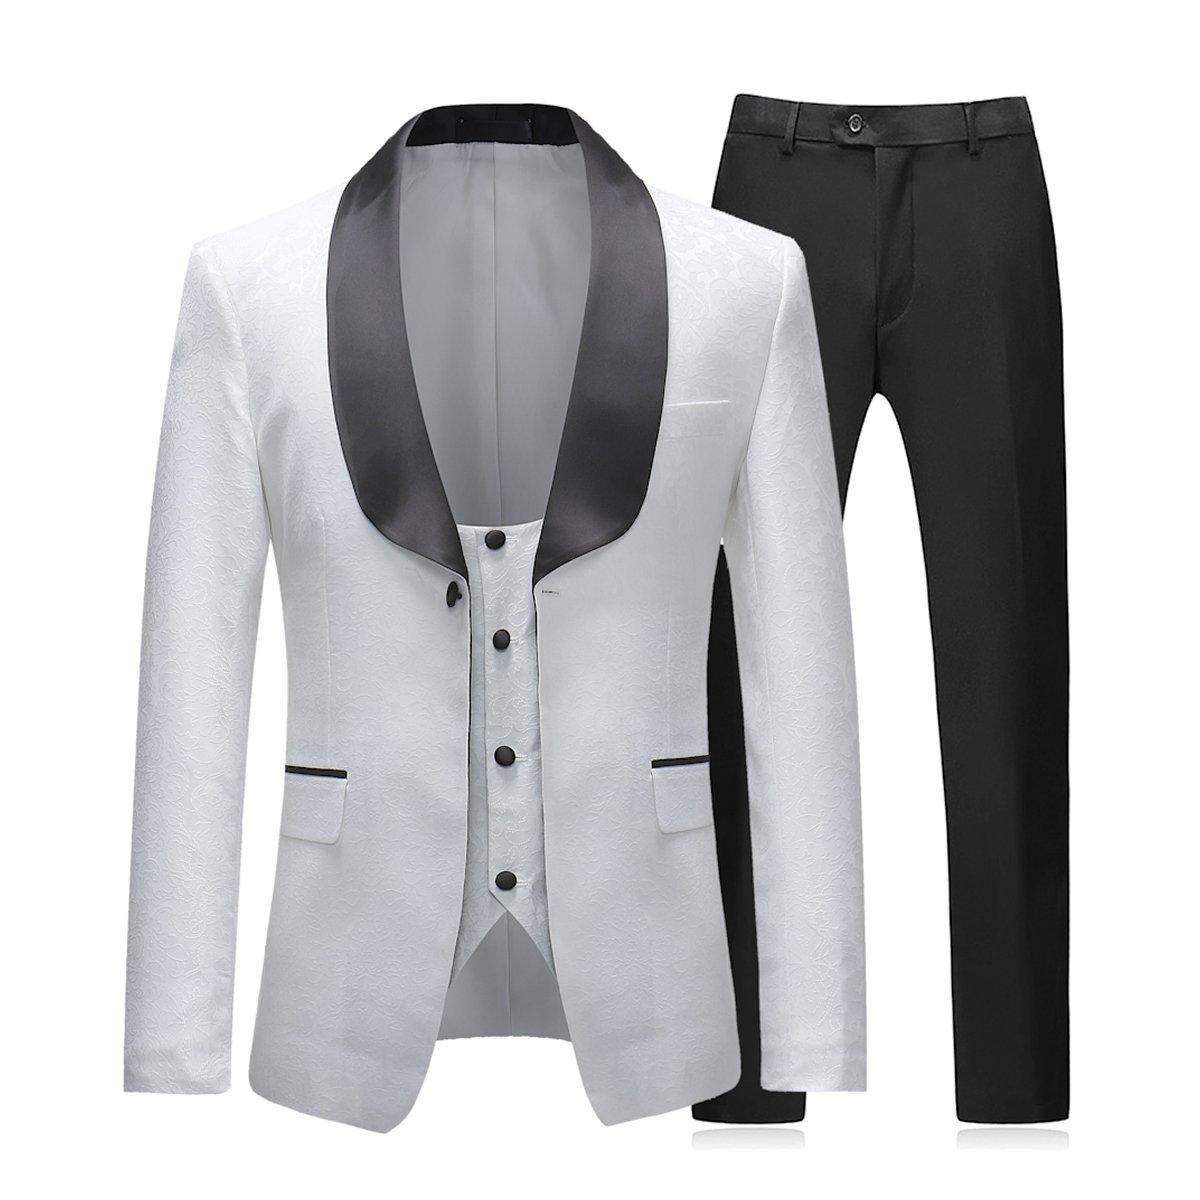 Boyland Men's Dress Tuxedo Suit Formal Wedding Slim Fit Stylish BlazerJackets Vest Pants White